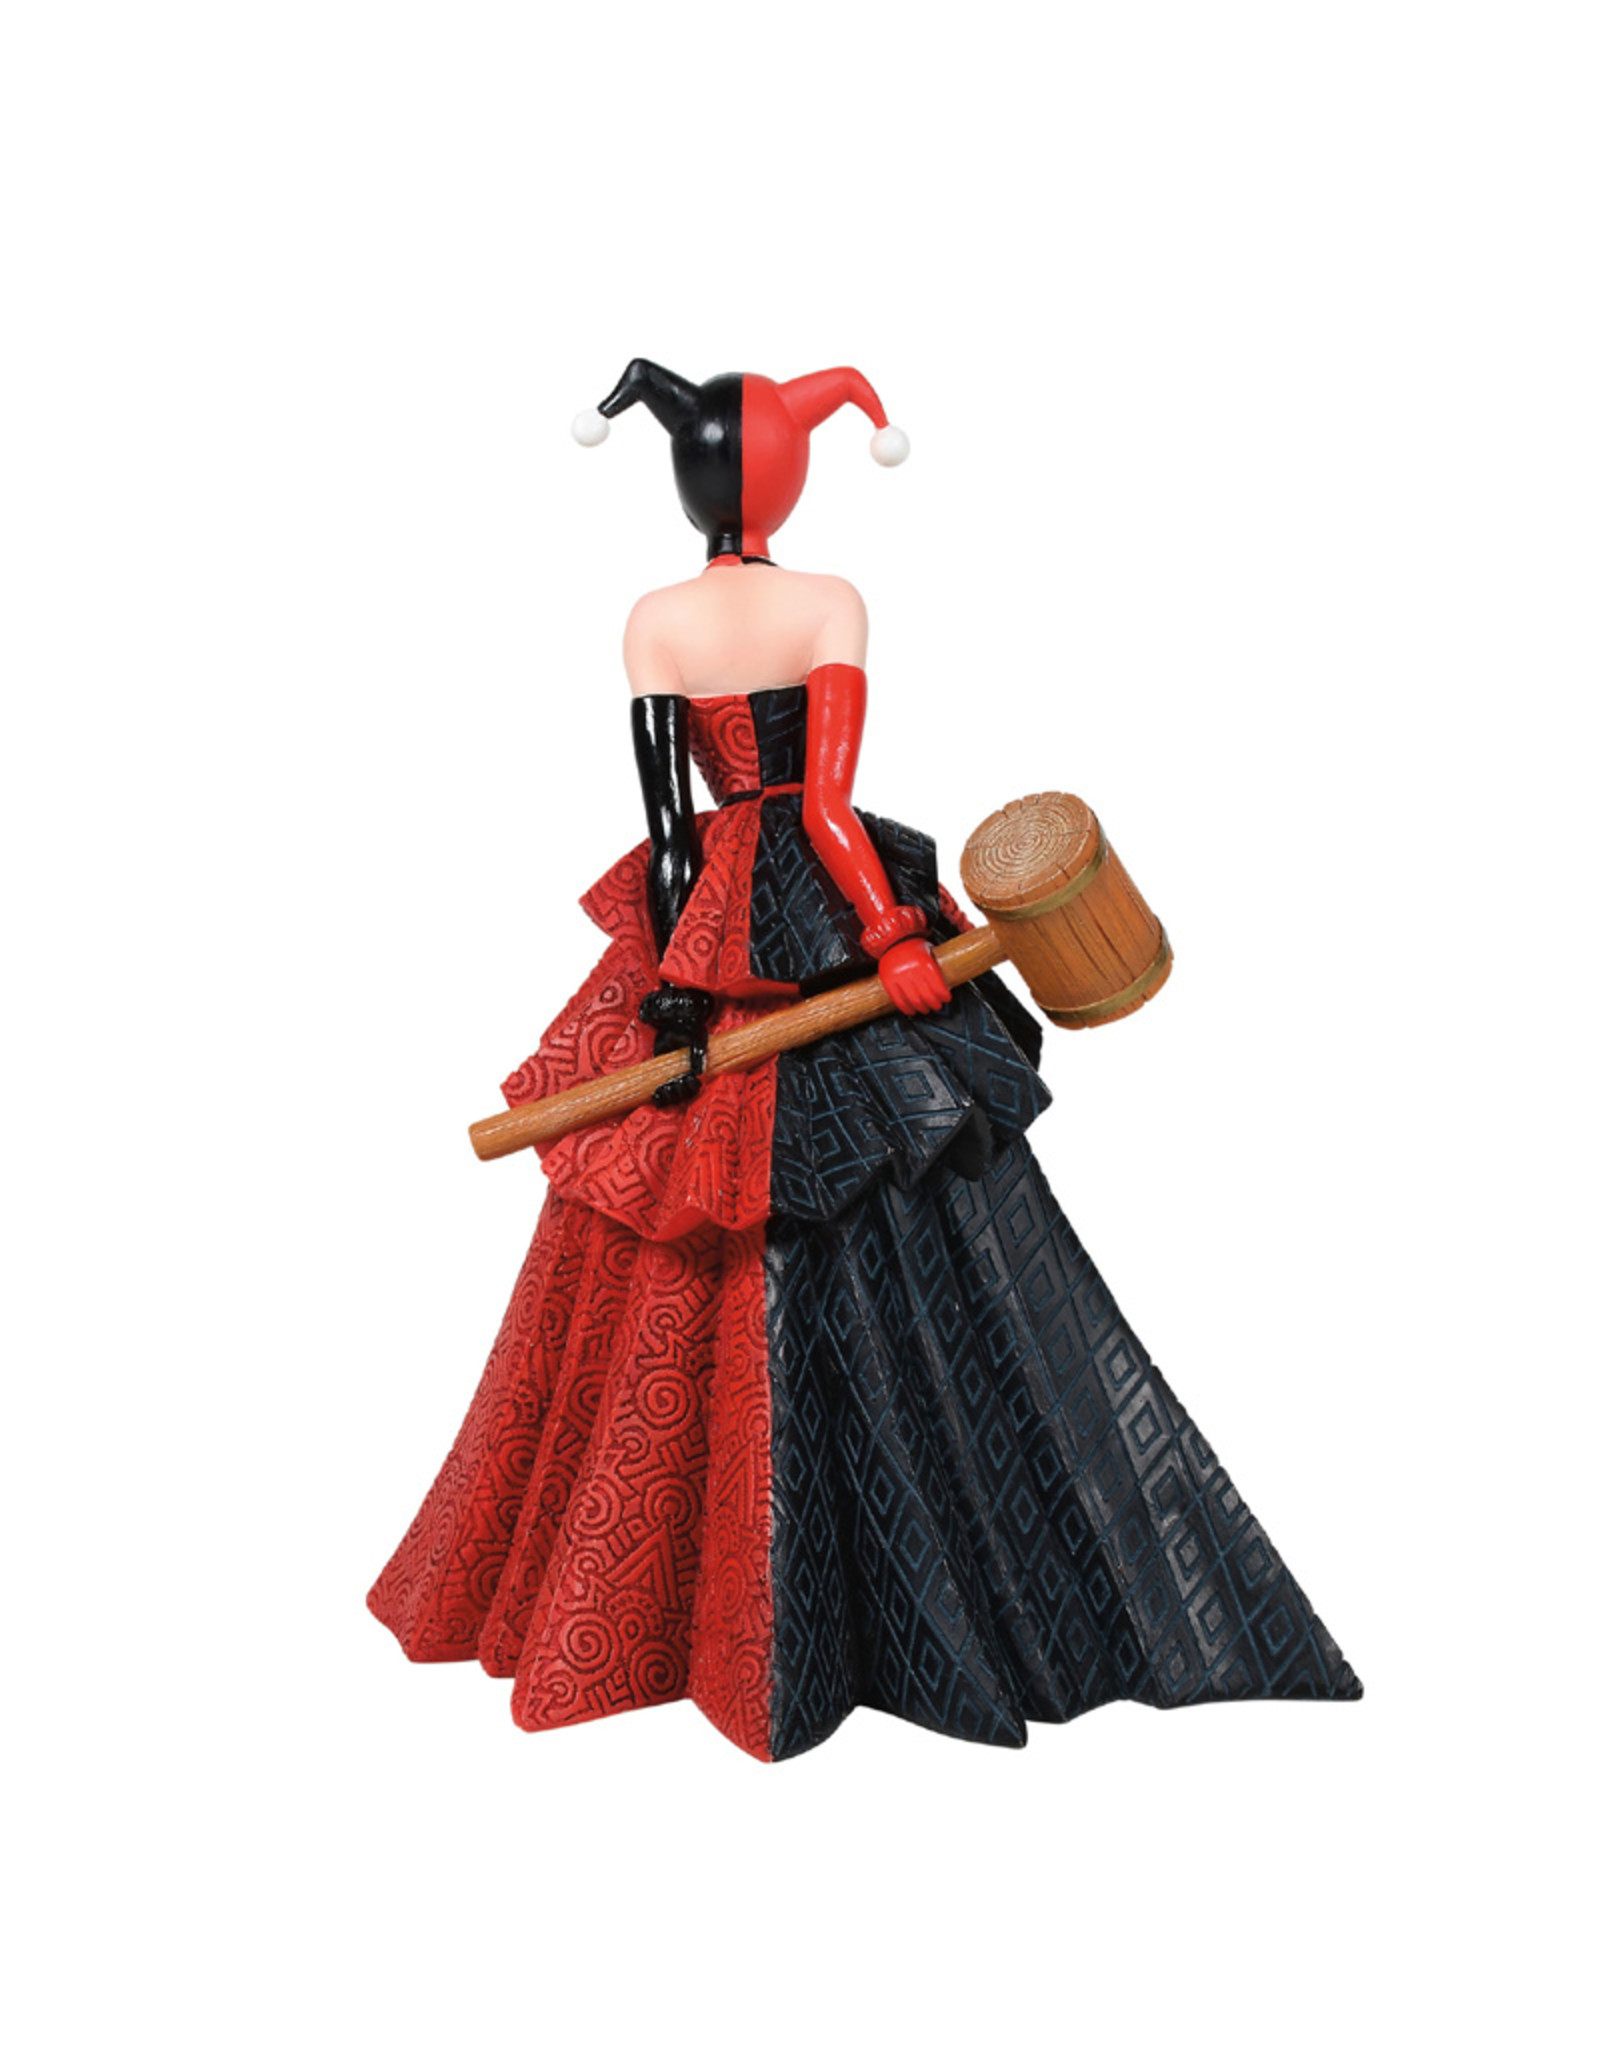 Dc comics Dc Comics ( Resin Figurine) Harley Quinn